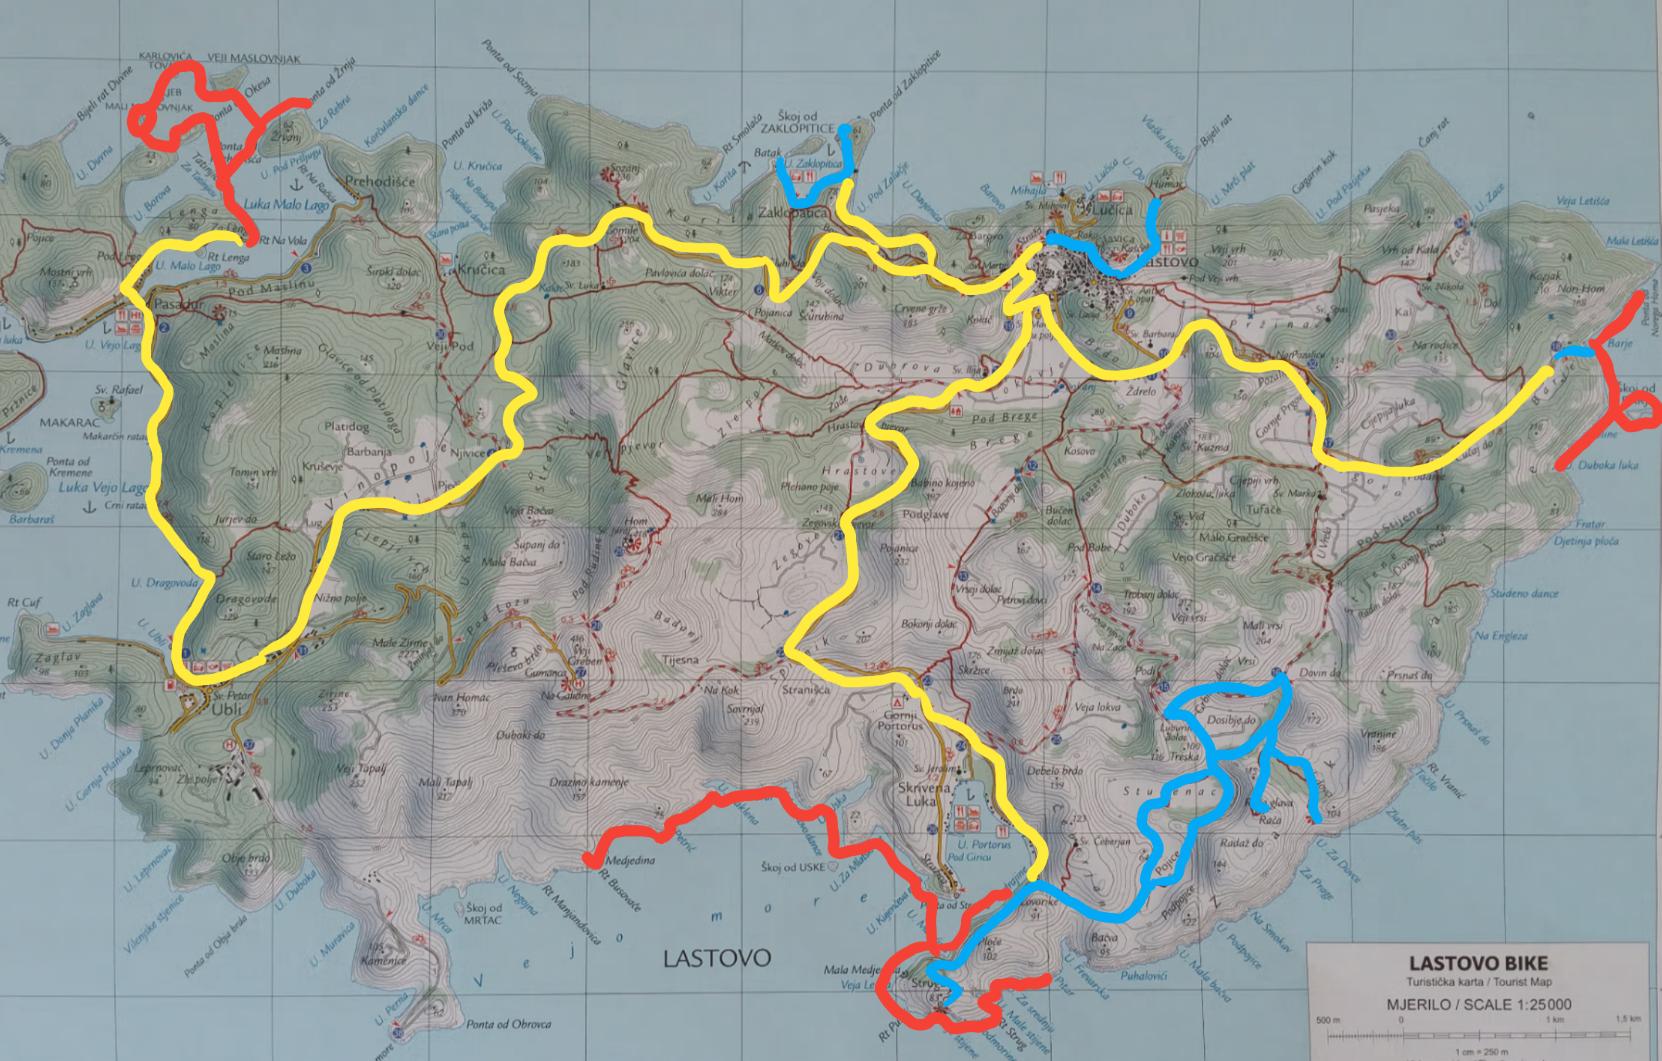 Lastovo 2017 - trip map